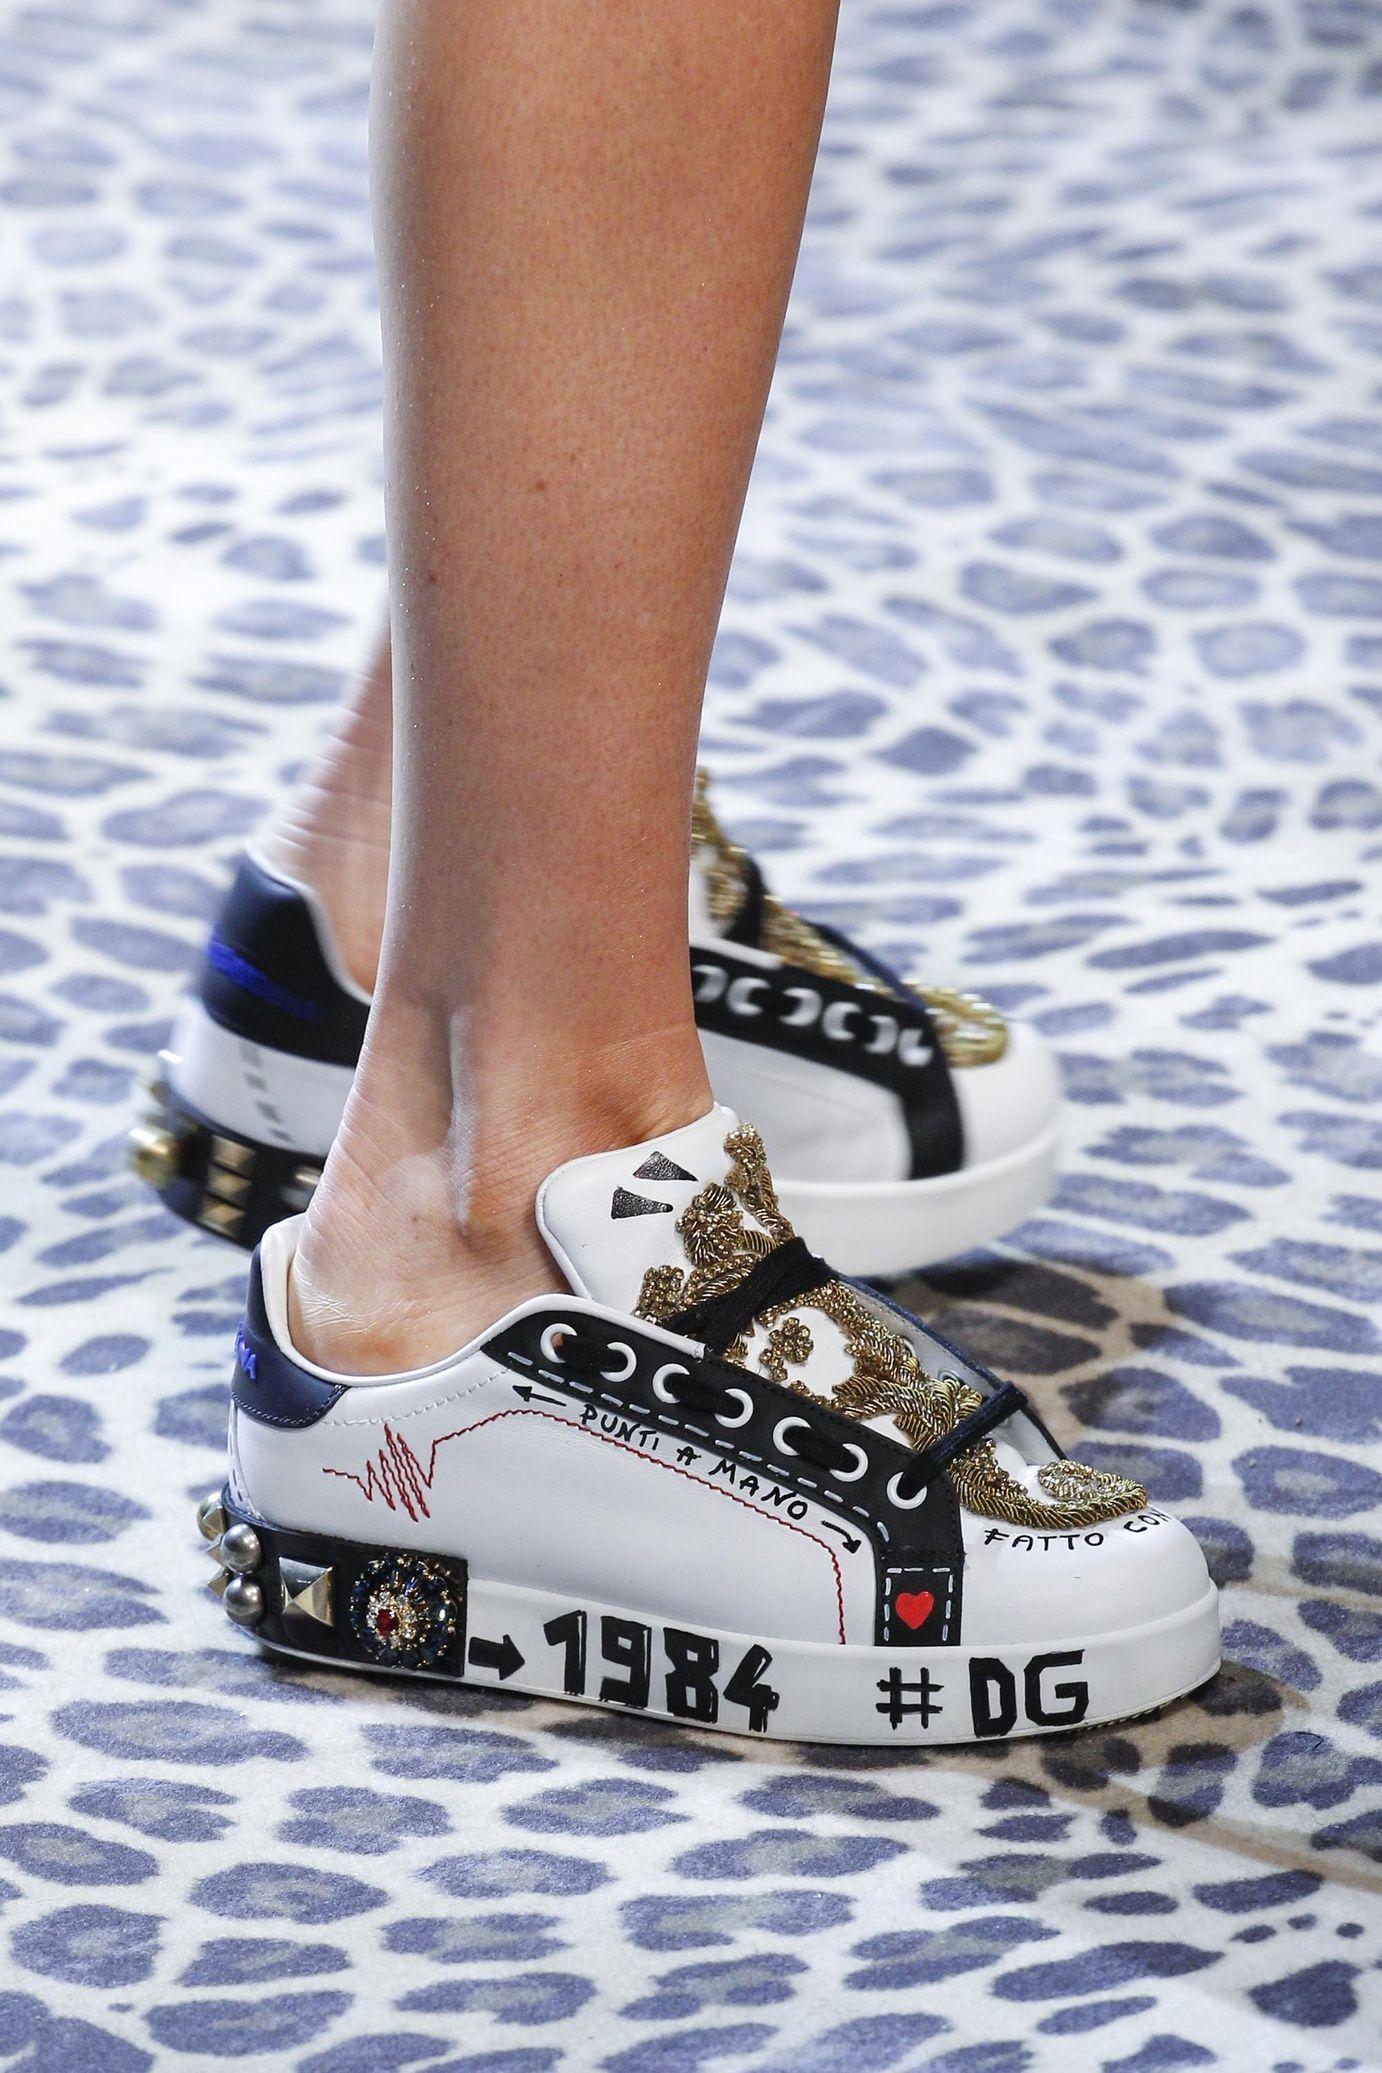 Défilés | Fine foot wear en 2019 | Chaussure mode, Chaussure